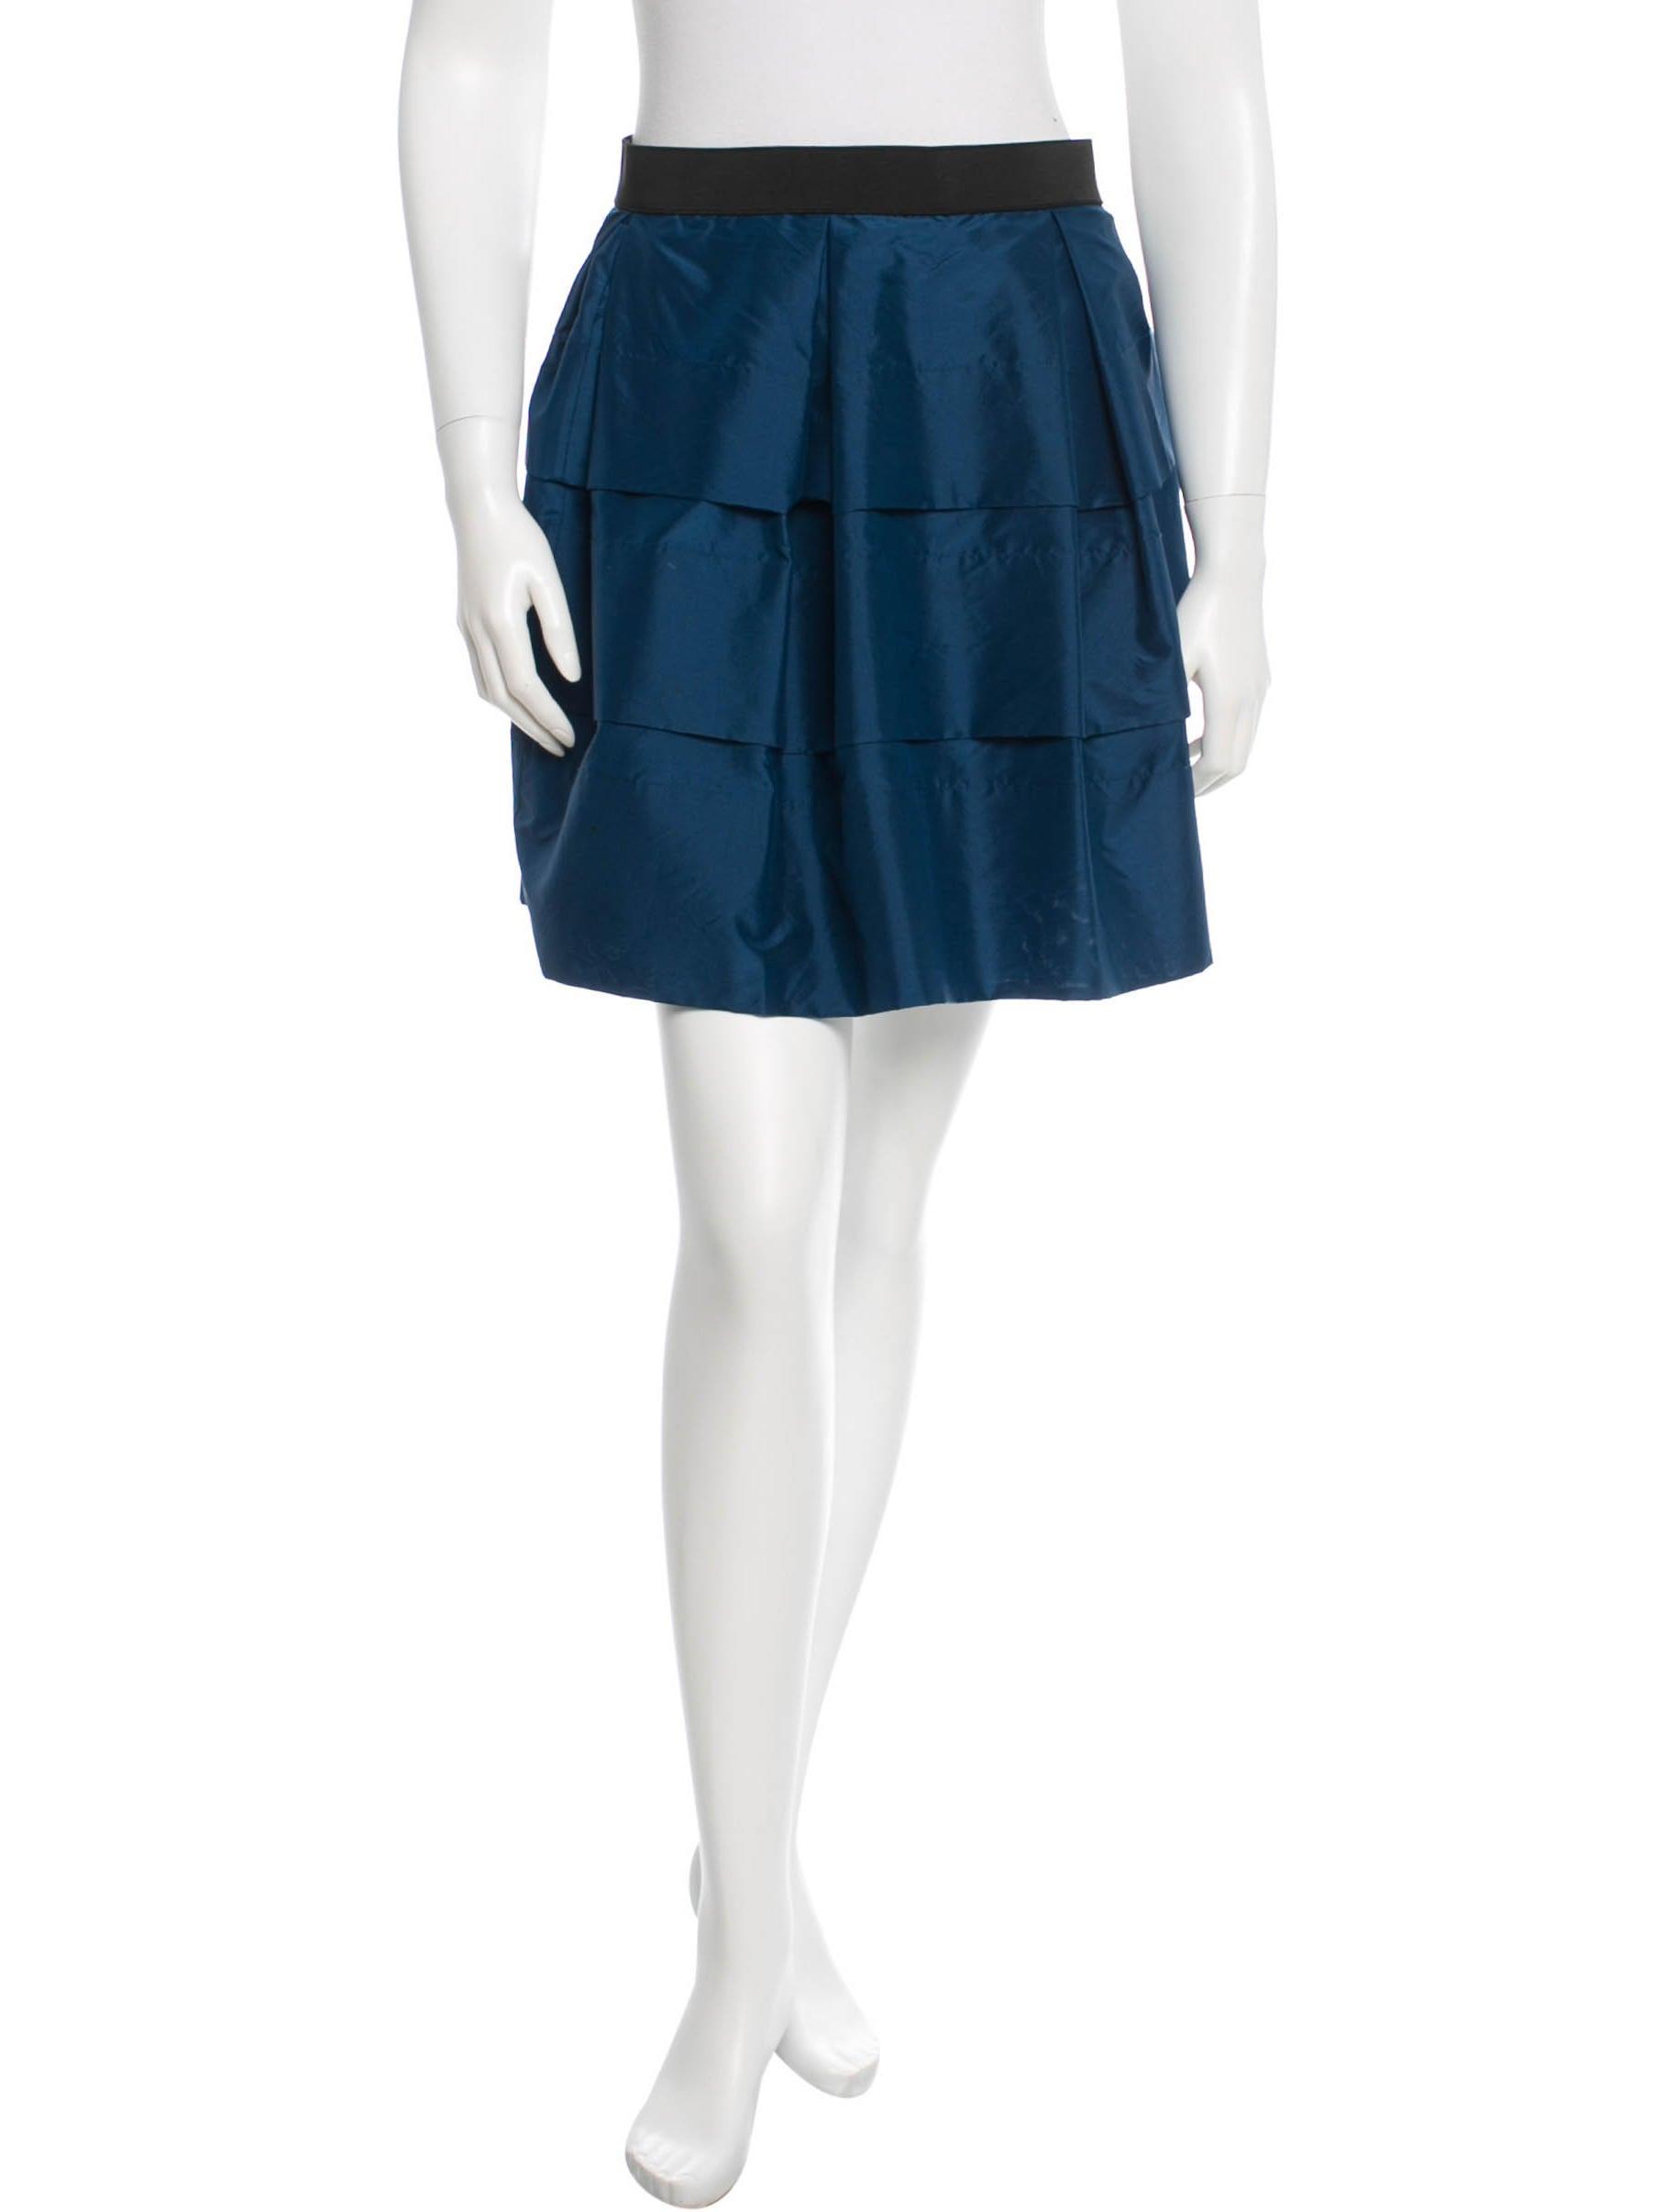 3 1 phillip lim silk a line skirt clothing w31ph31786